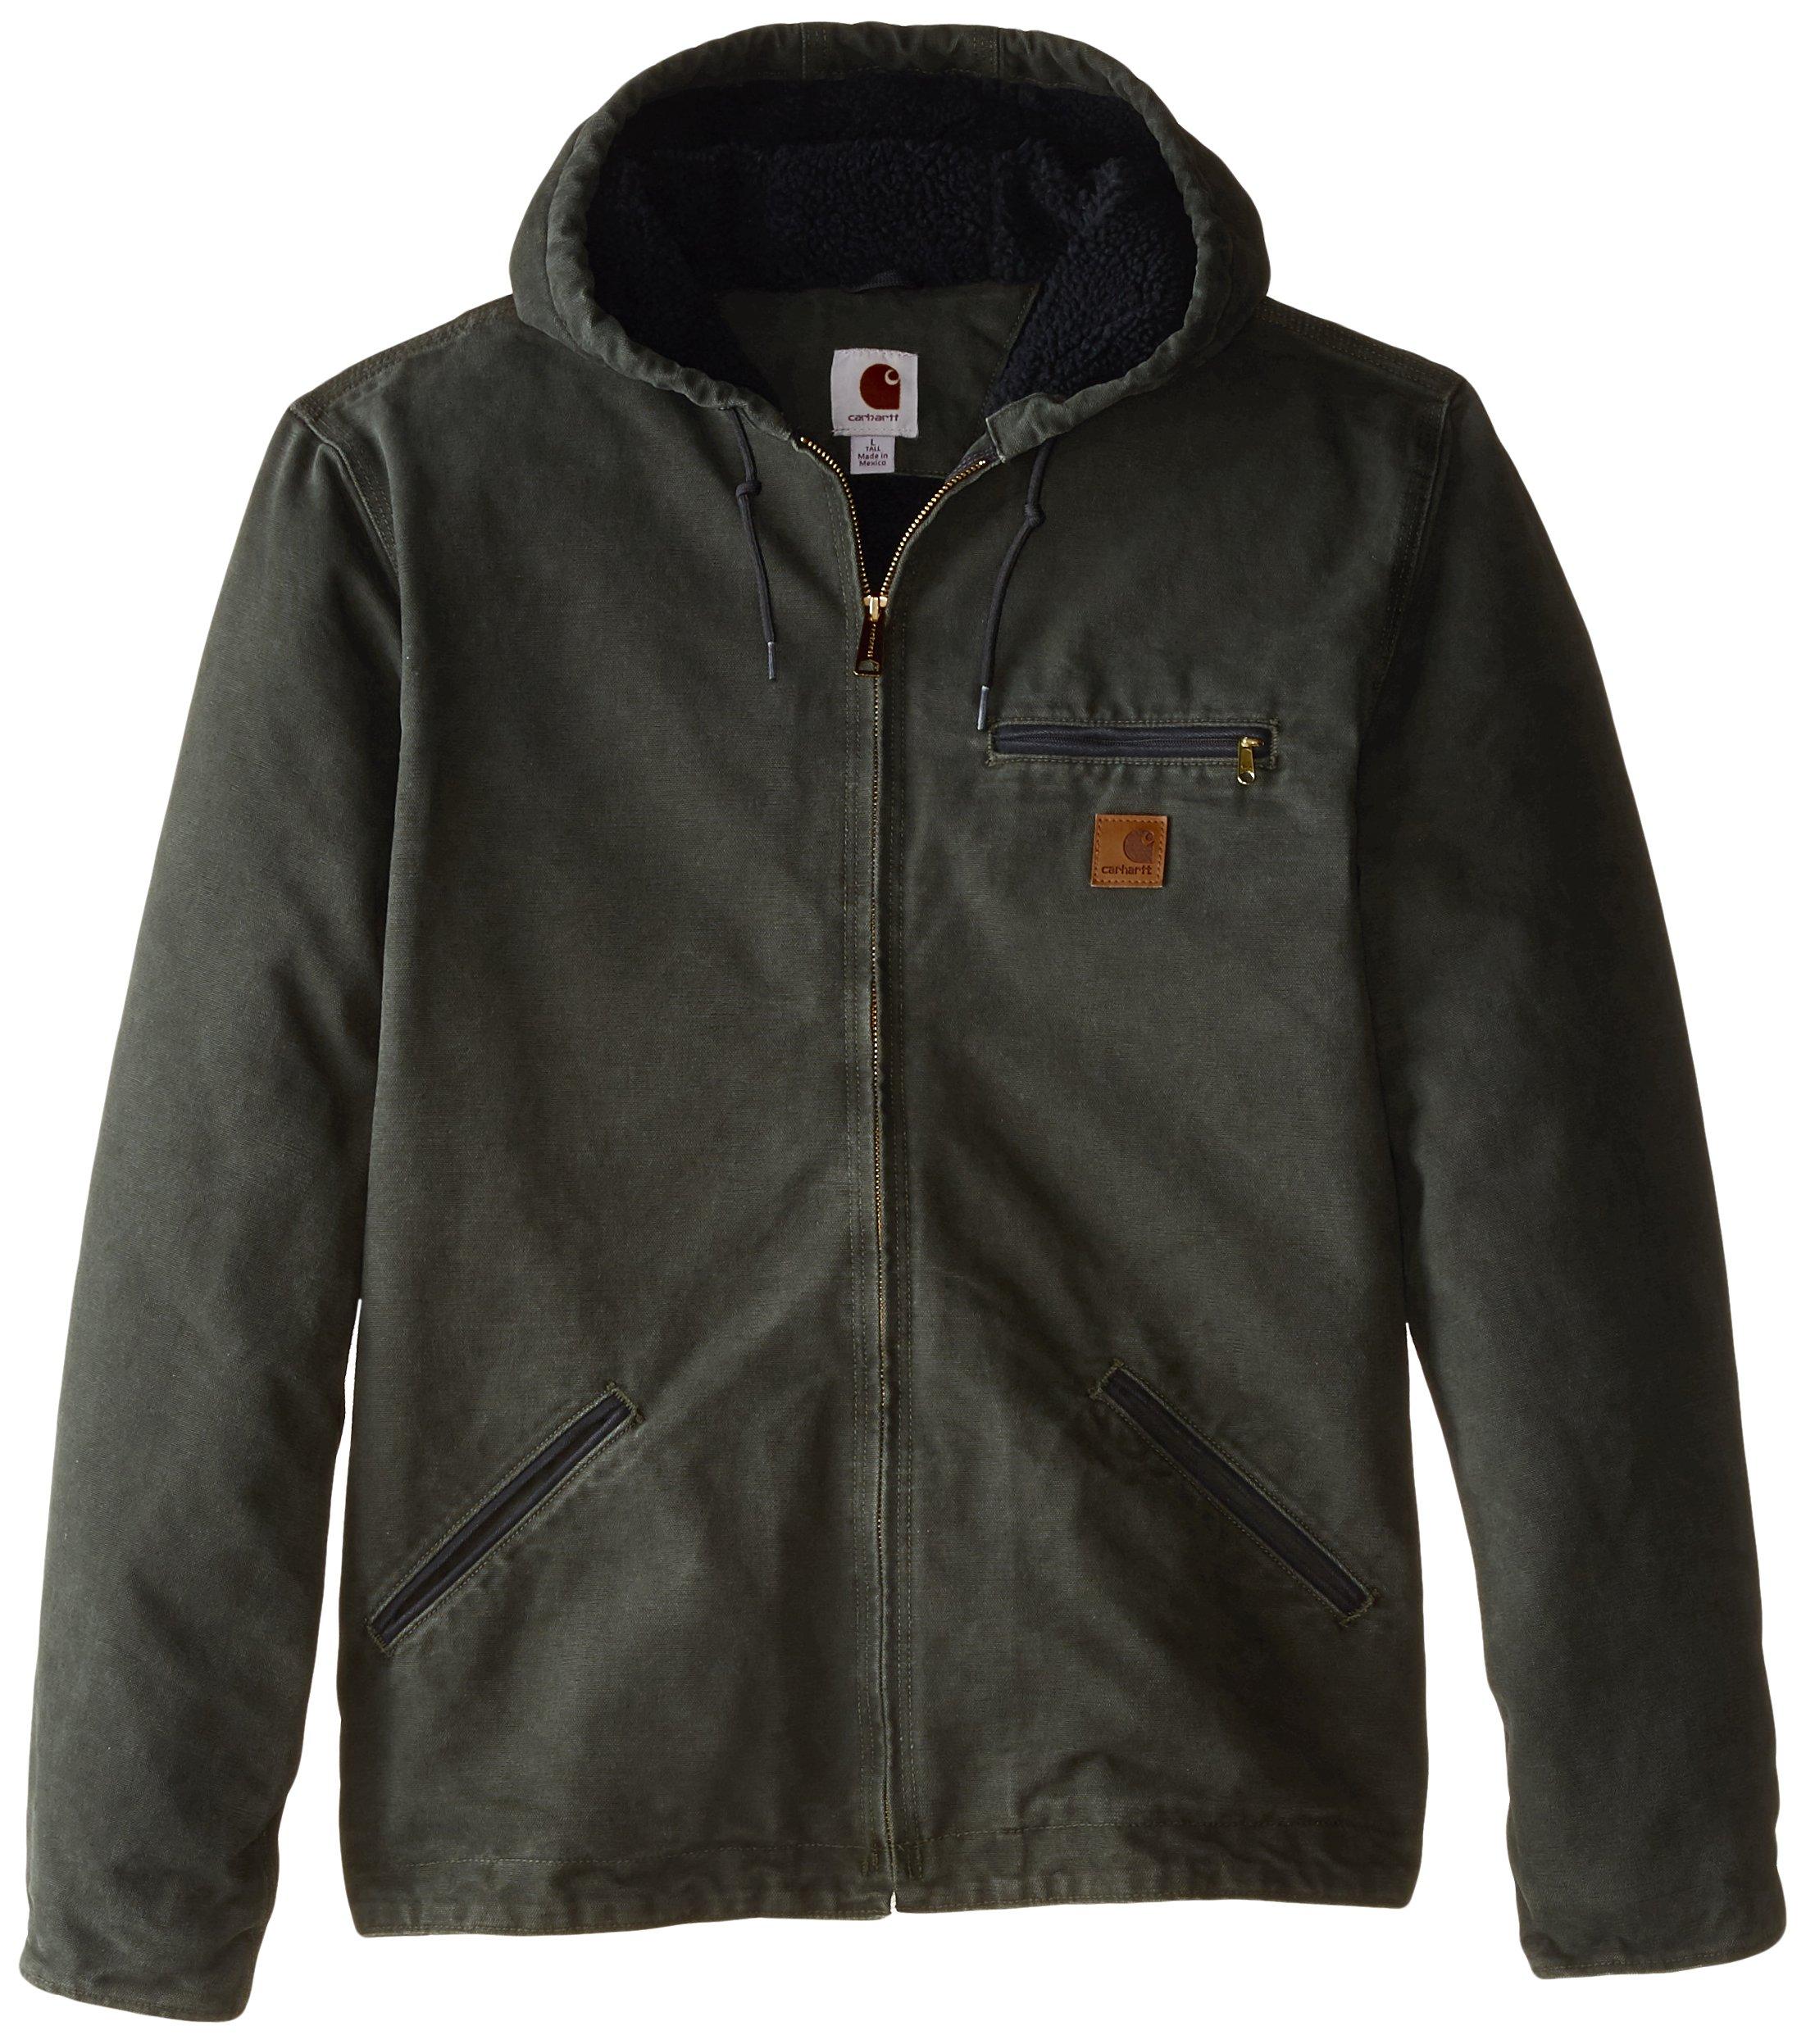 Carhartt Men's Big & Tall Sherpa Lined Sandstone Sierra Jacket J141,Moss,3X-Large